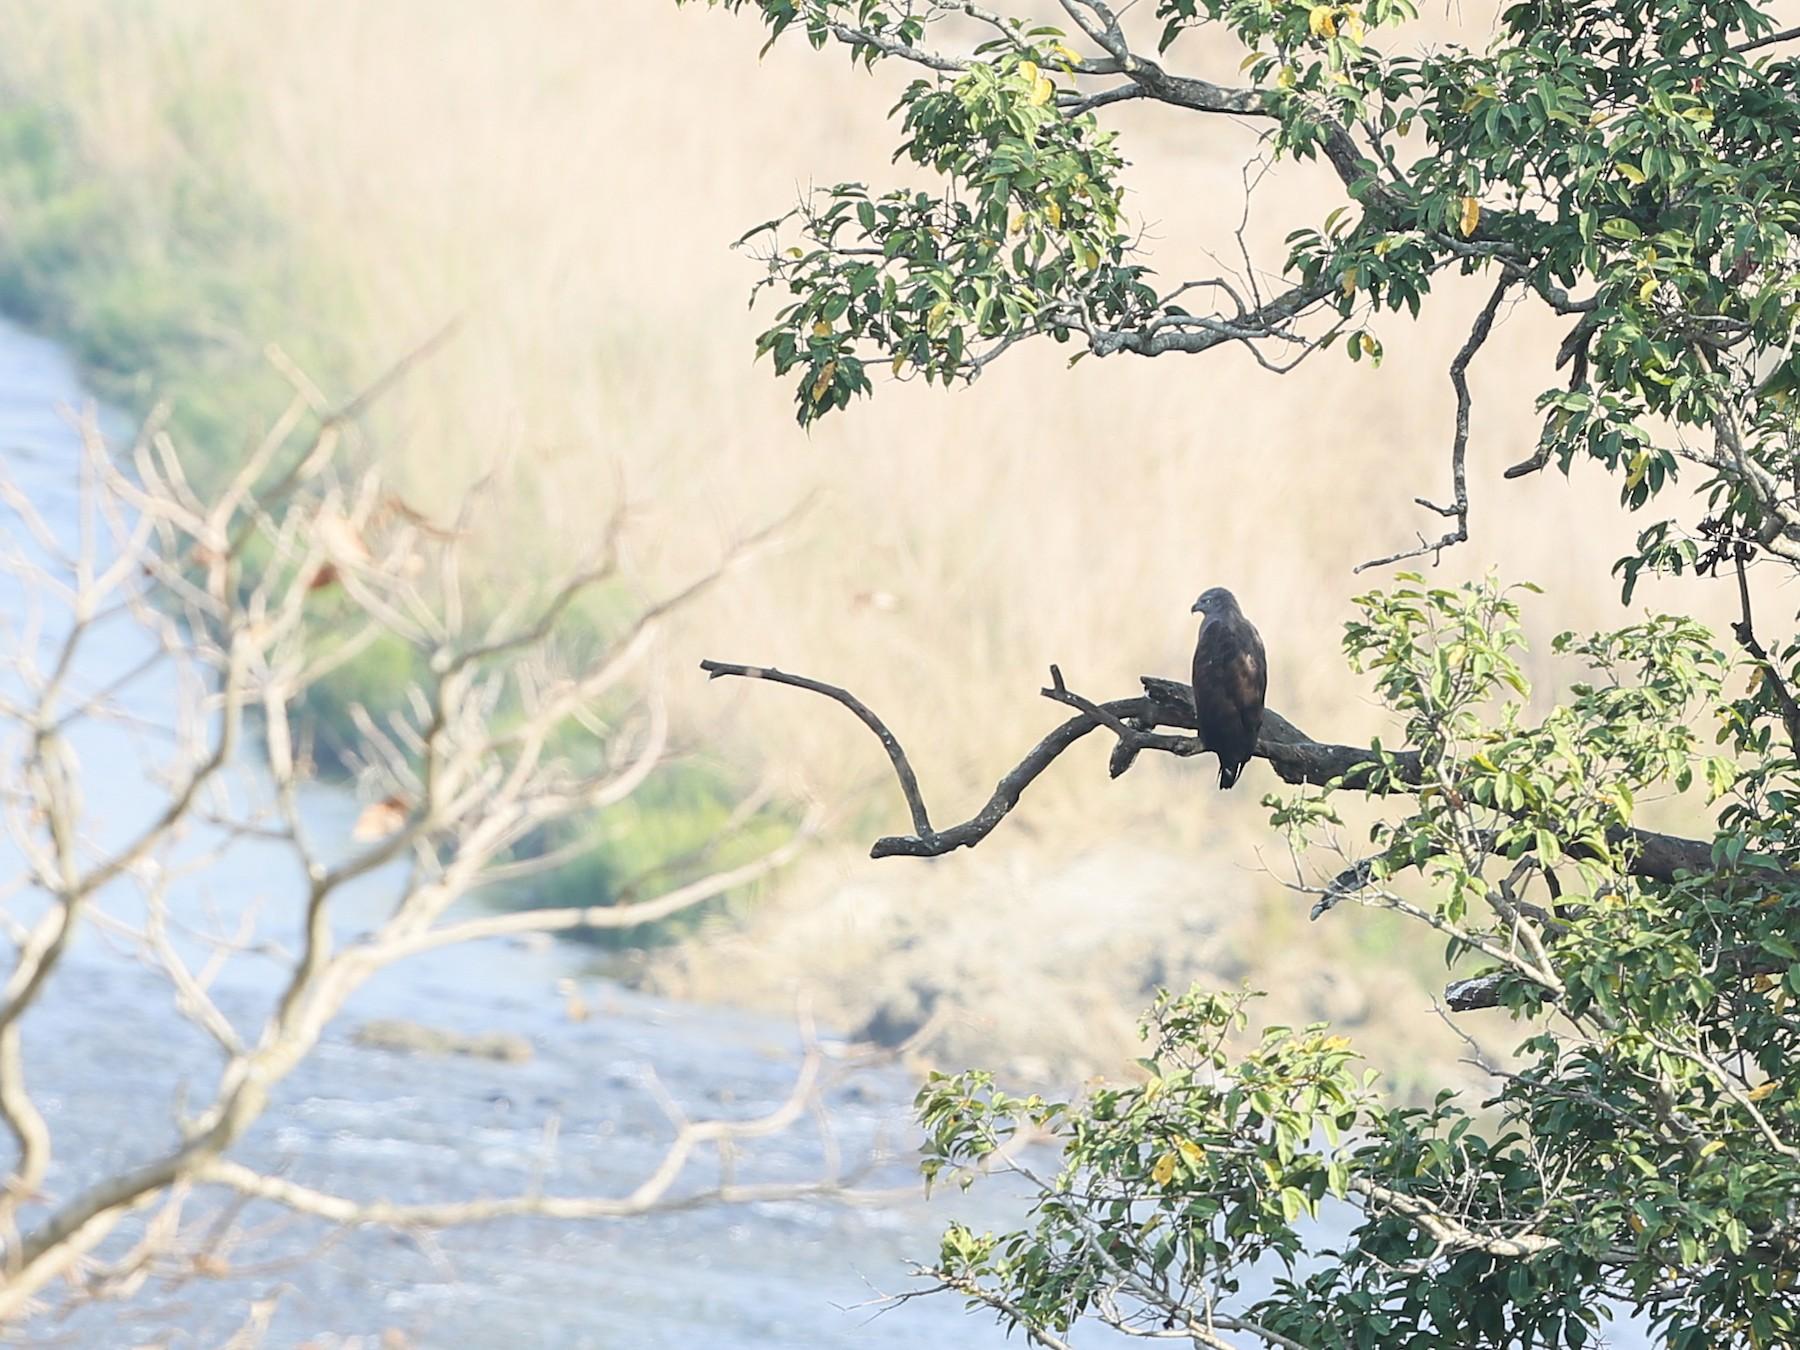 Lesser Fish-Eagle - Gaurang Bagda